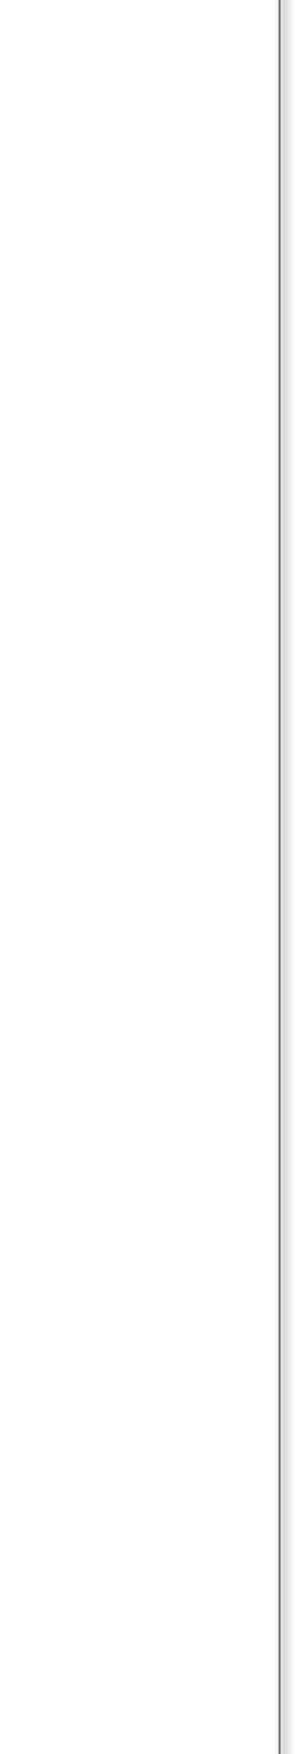 gray-line-png.jpg